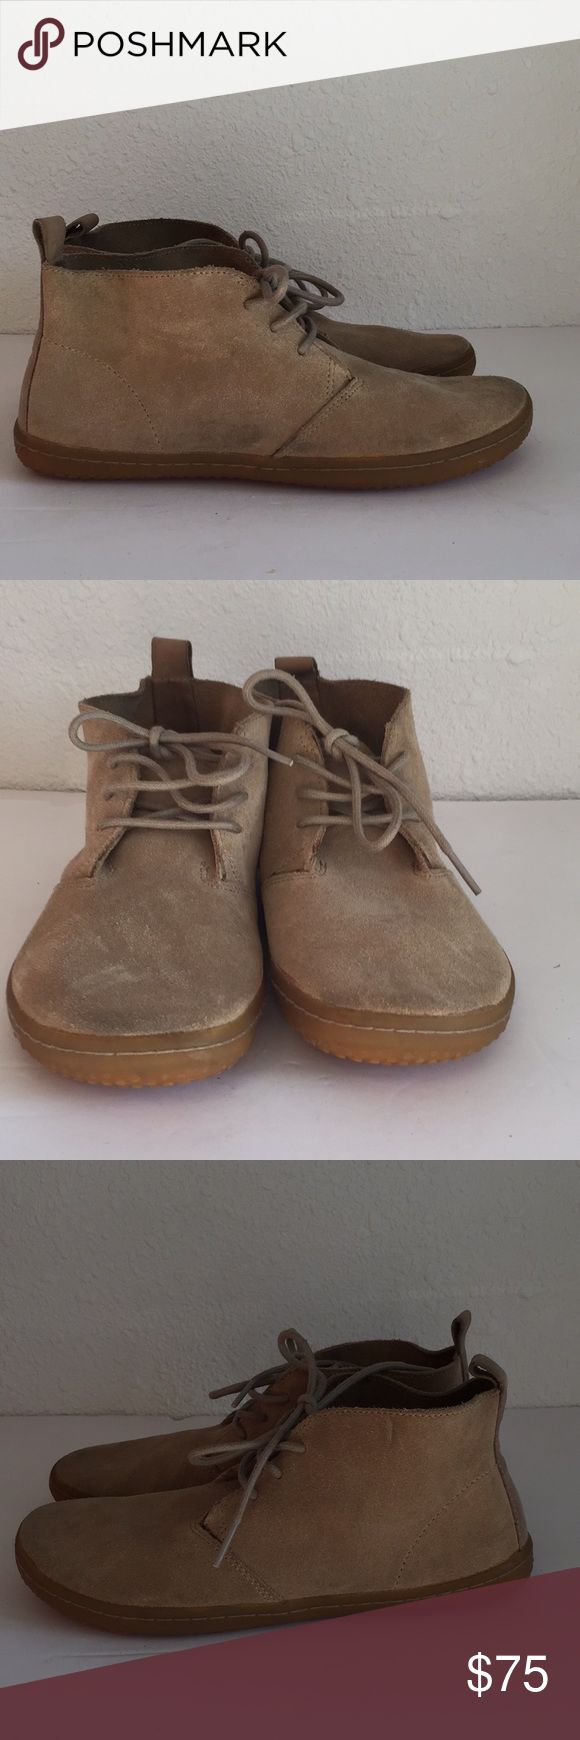 ViVobarefoot Gobi Chukka Boots Women's 37 (sz 7) ViVobarefoot Gobi Chukka Boots Men's 37. GREAT used condition. Tan suede Leather, slight marks as seen in pics. Minimal wear on bottoms. Vivo barefoot Shoes Winter & Rain Boots